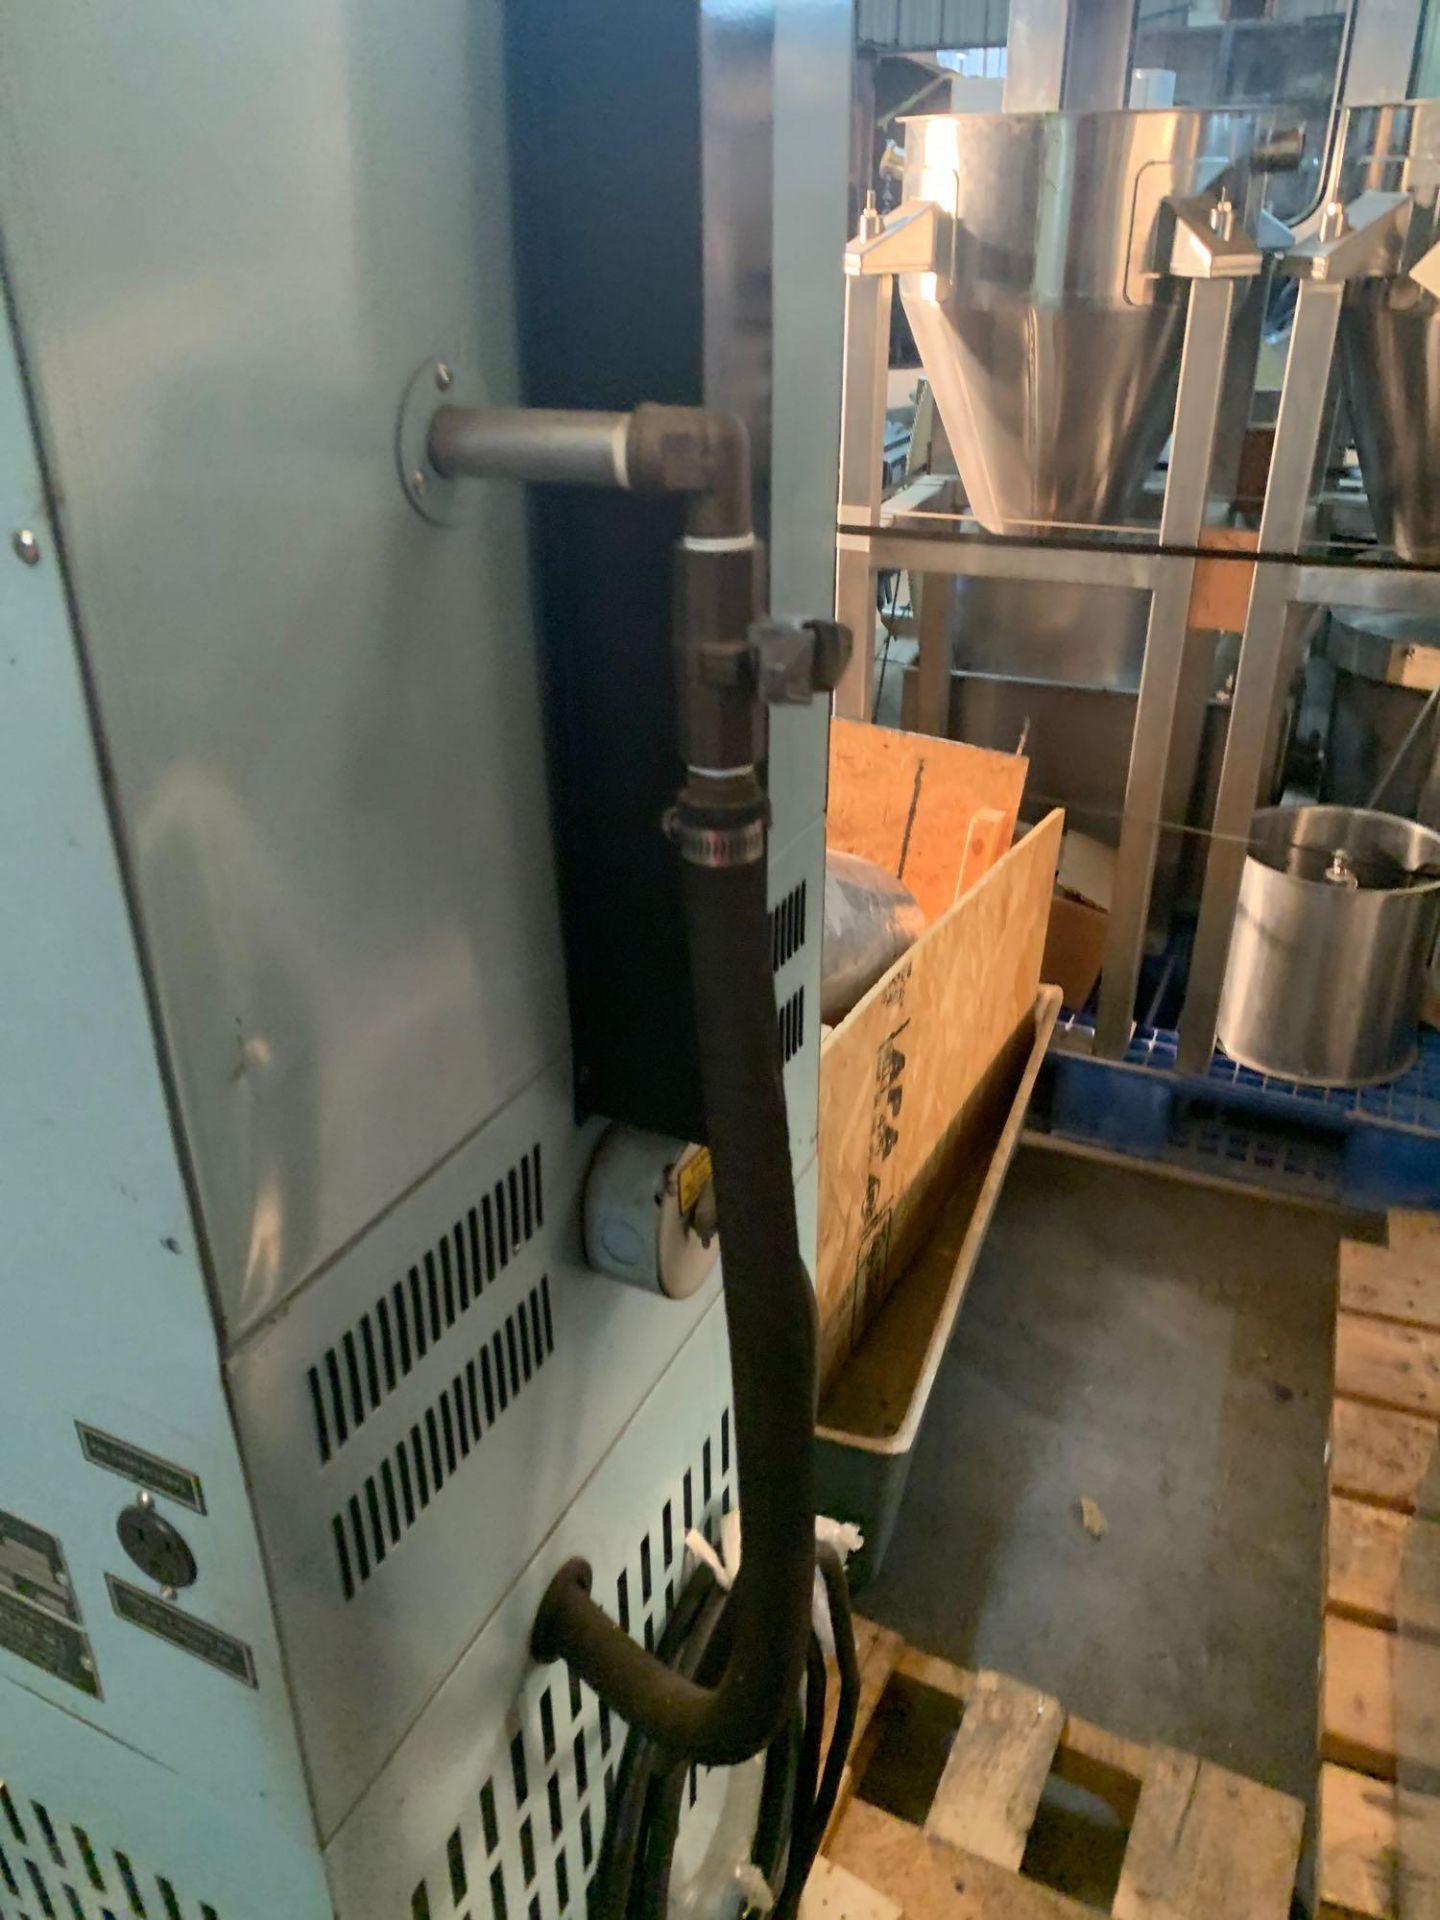 Blue M Vacuum Oven and Pump, Temp Range 260c-500f - Image 4 of 5